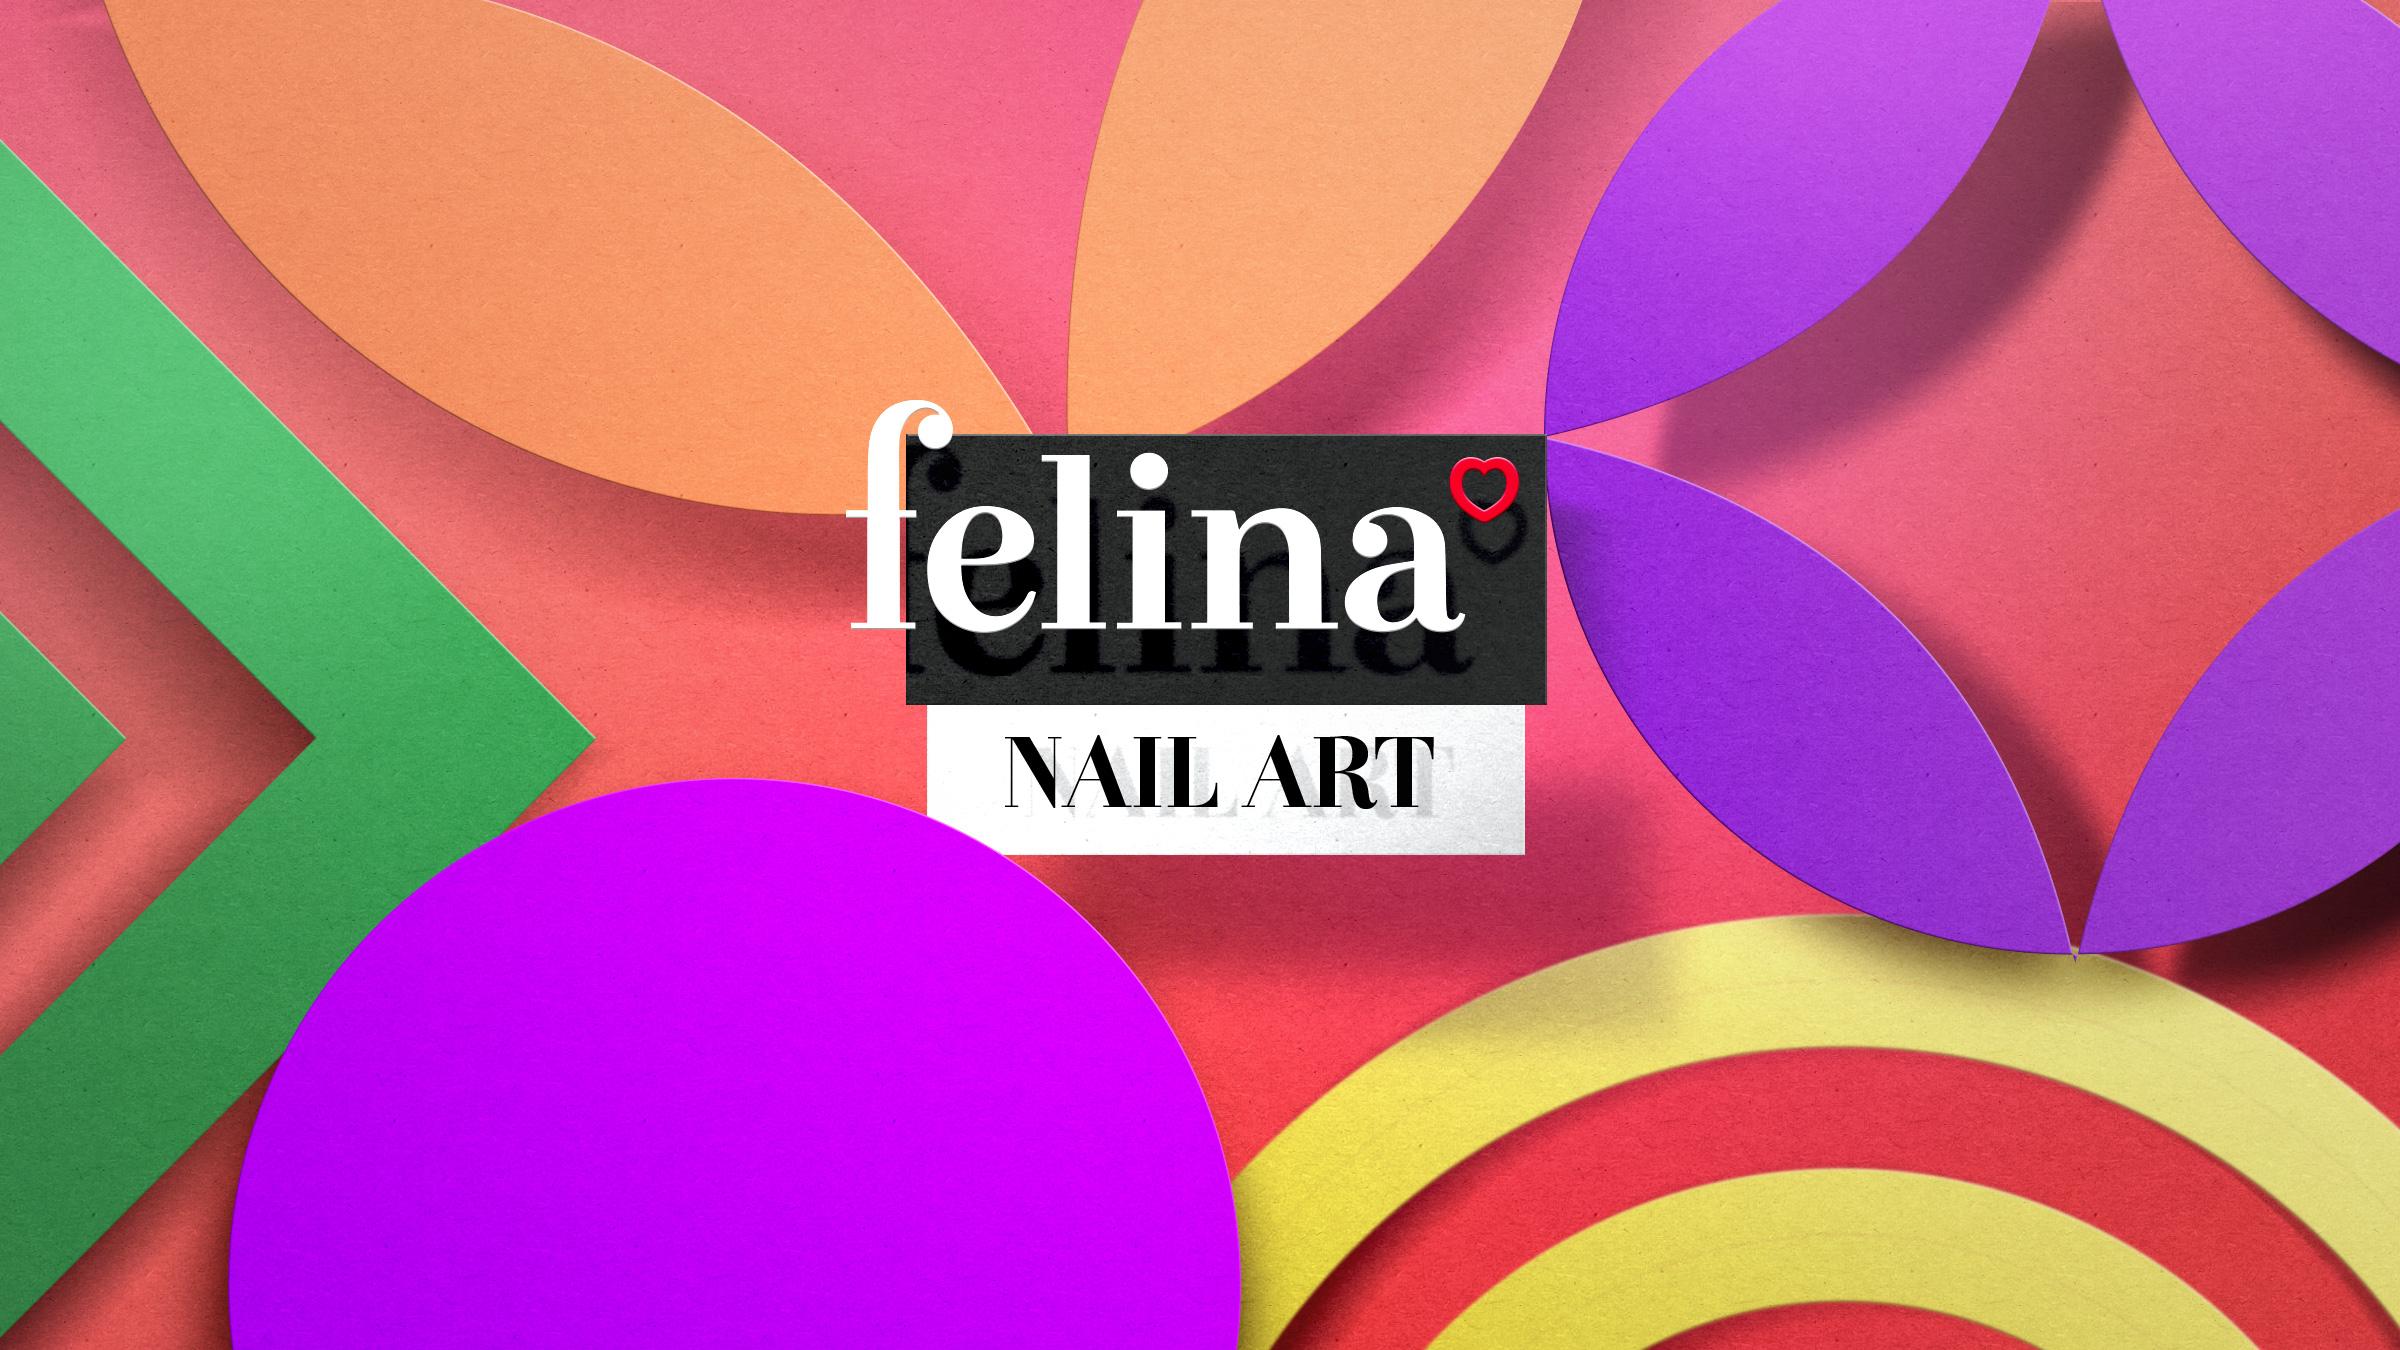 packaging design Felina Nail Art